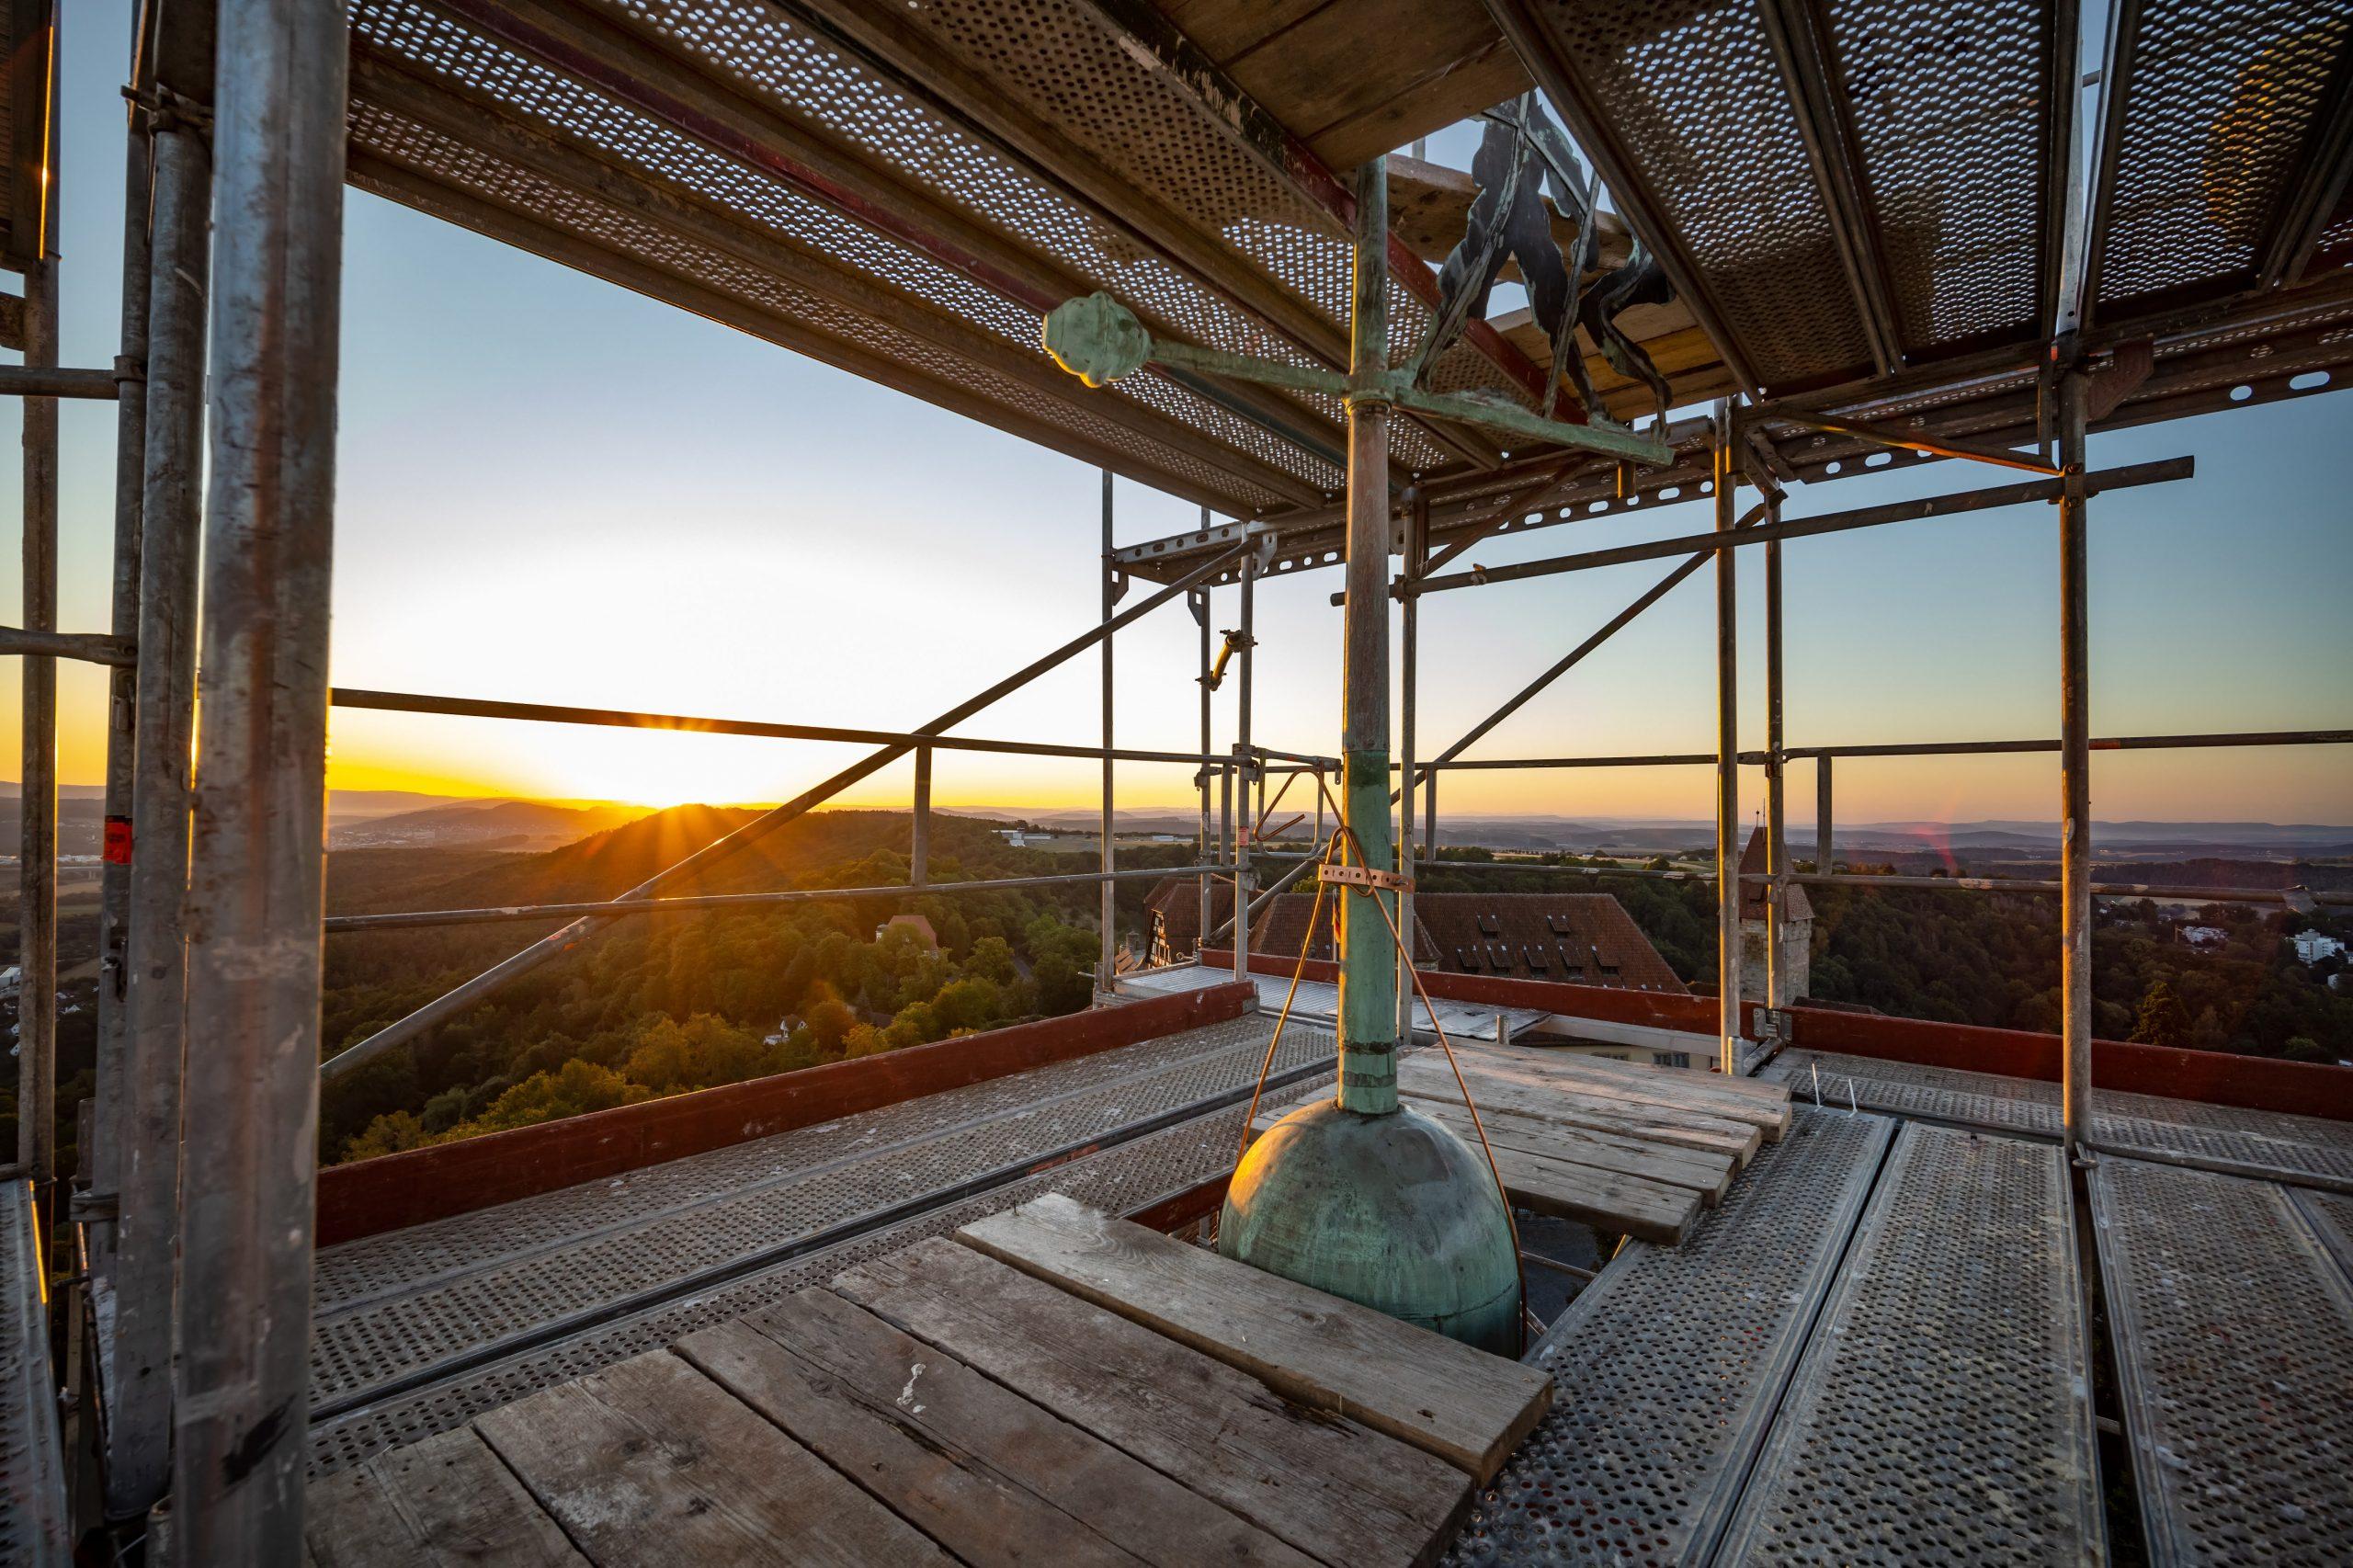 Wetterfahne des Roten Turms der Veste Coburg bei Sonnenaufgang